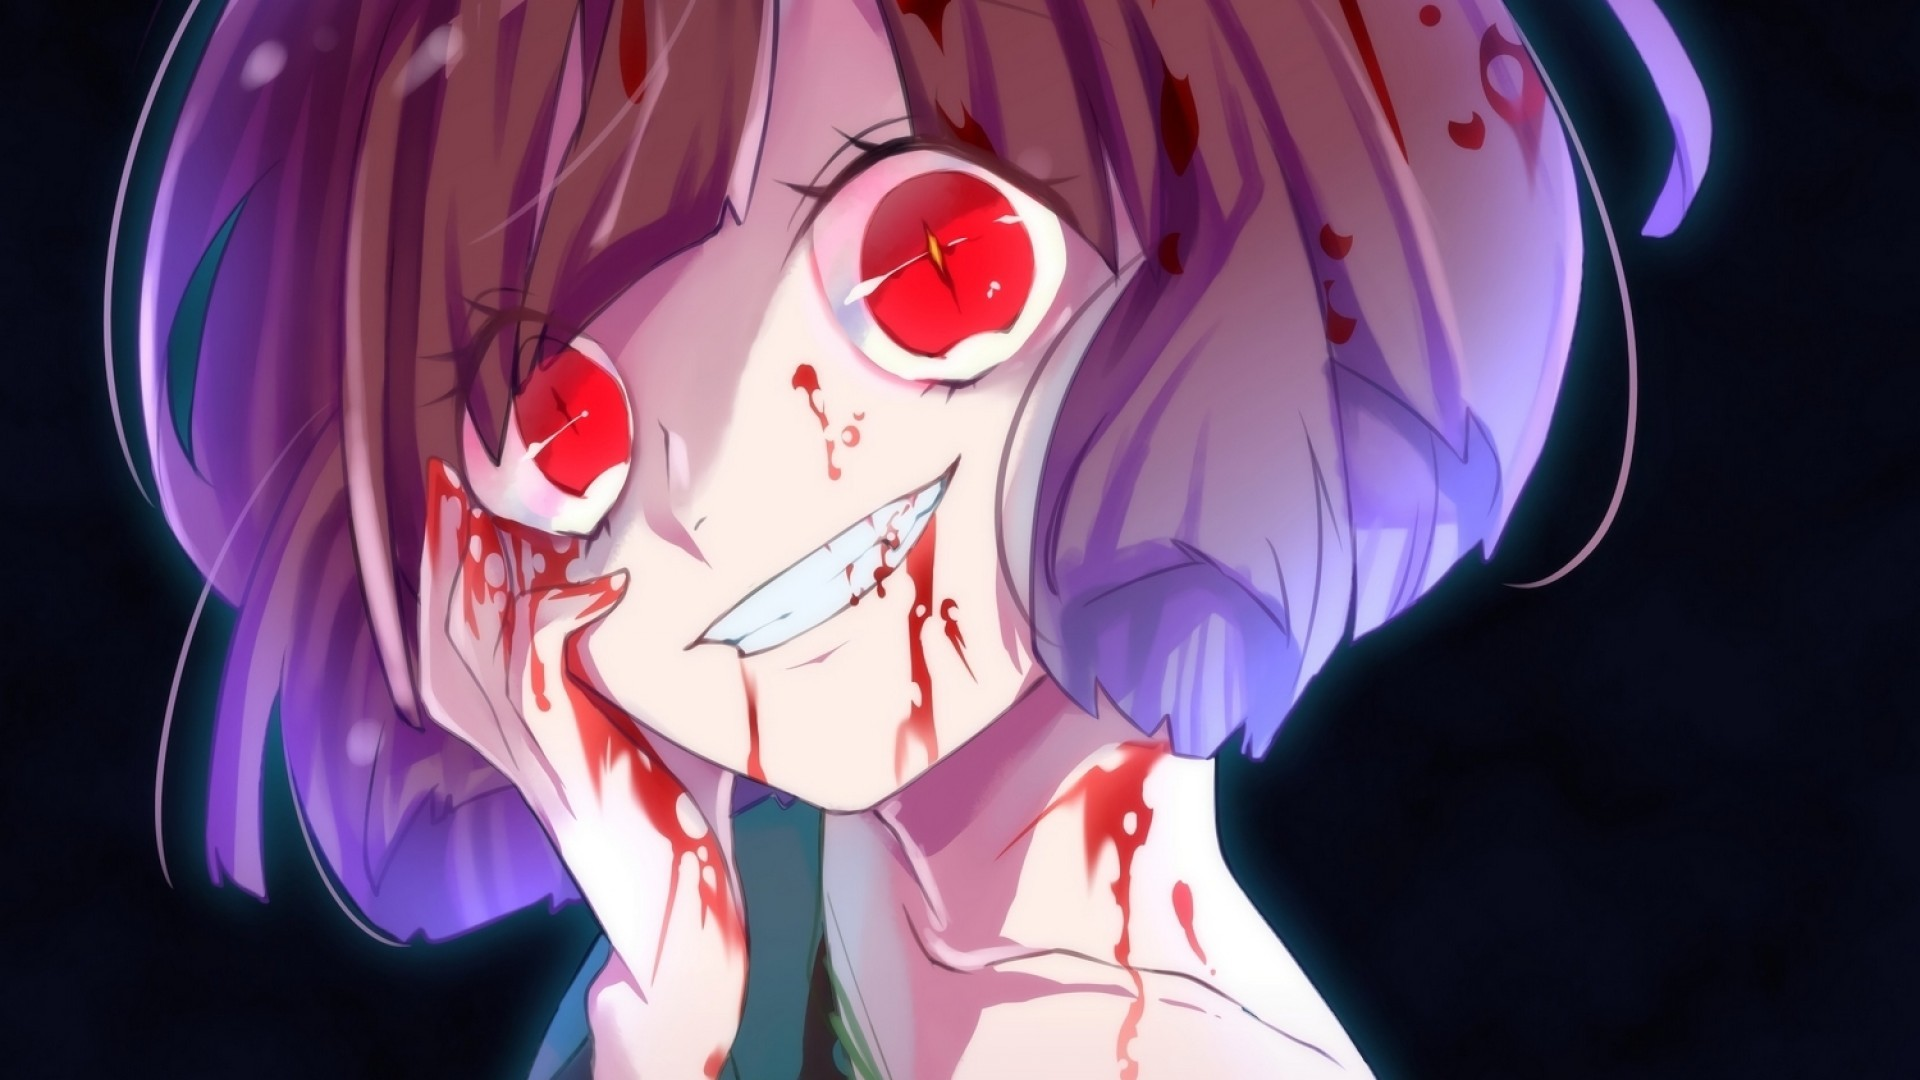 Undertale, Chara, Yandere, Creepy Smile, Anime Style